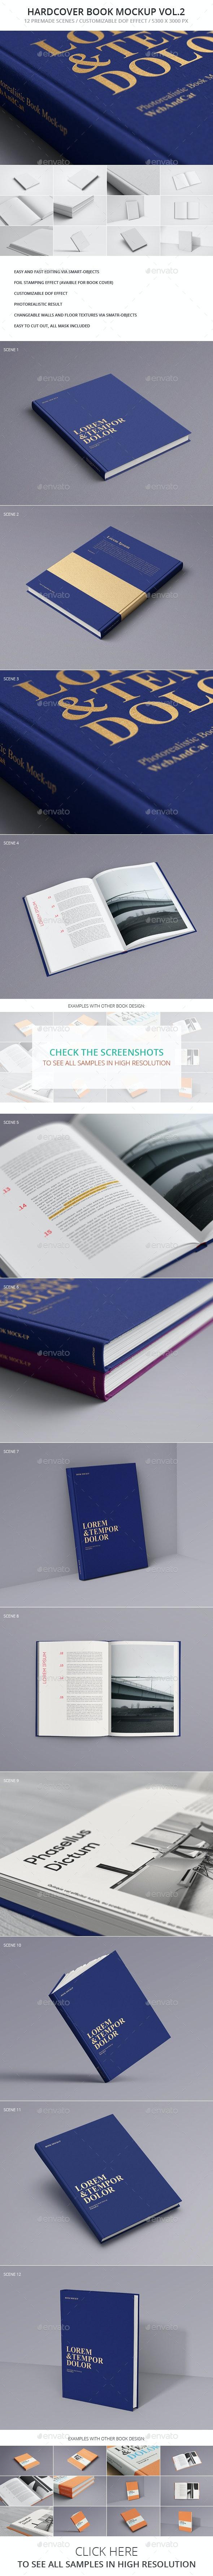 Book Mockup Vol.2 - Books Print